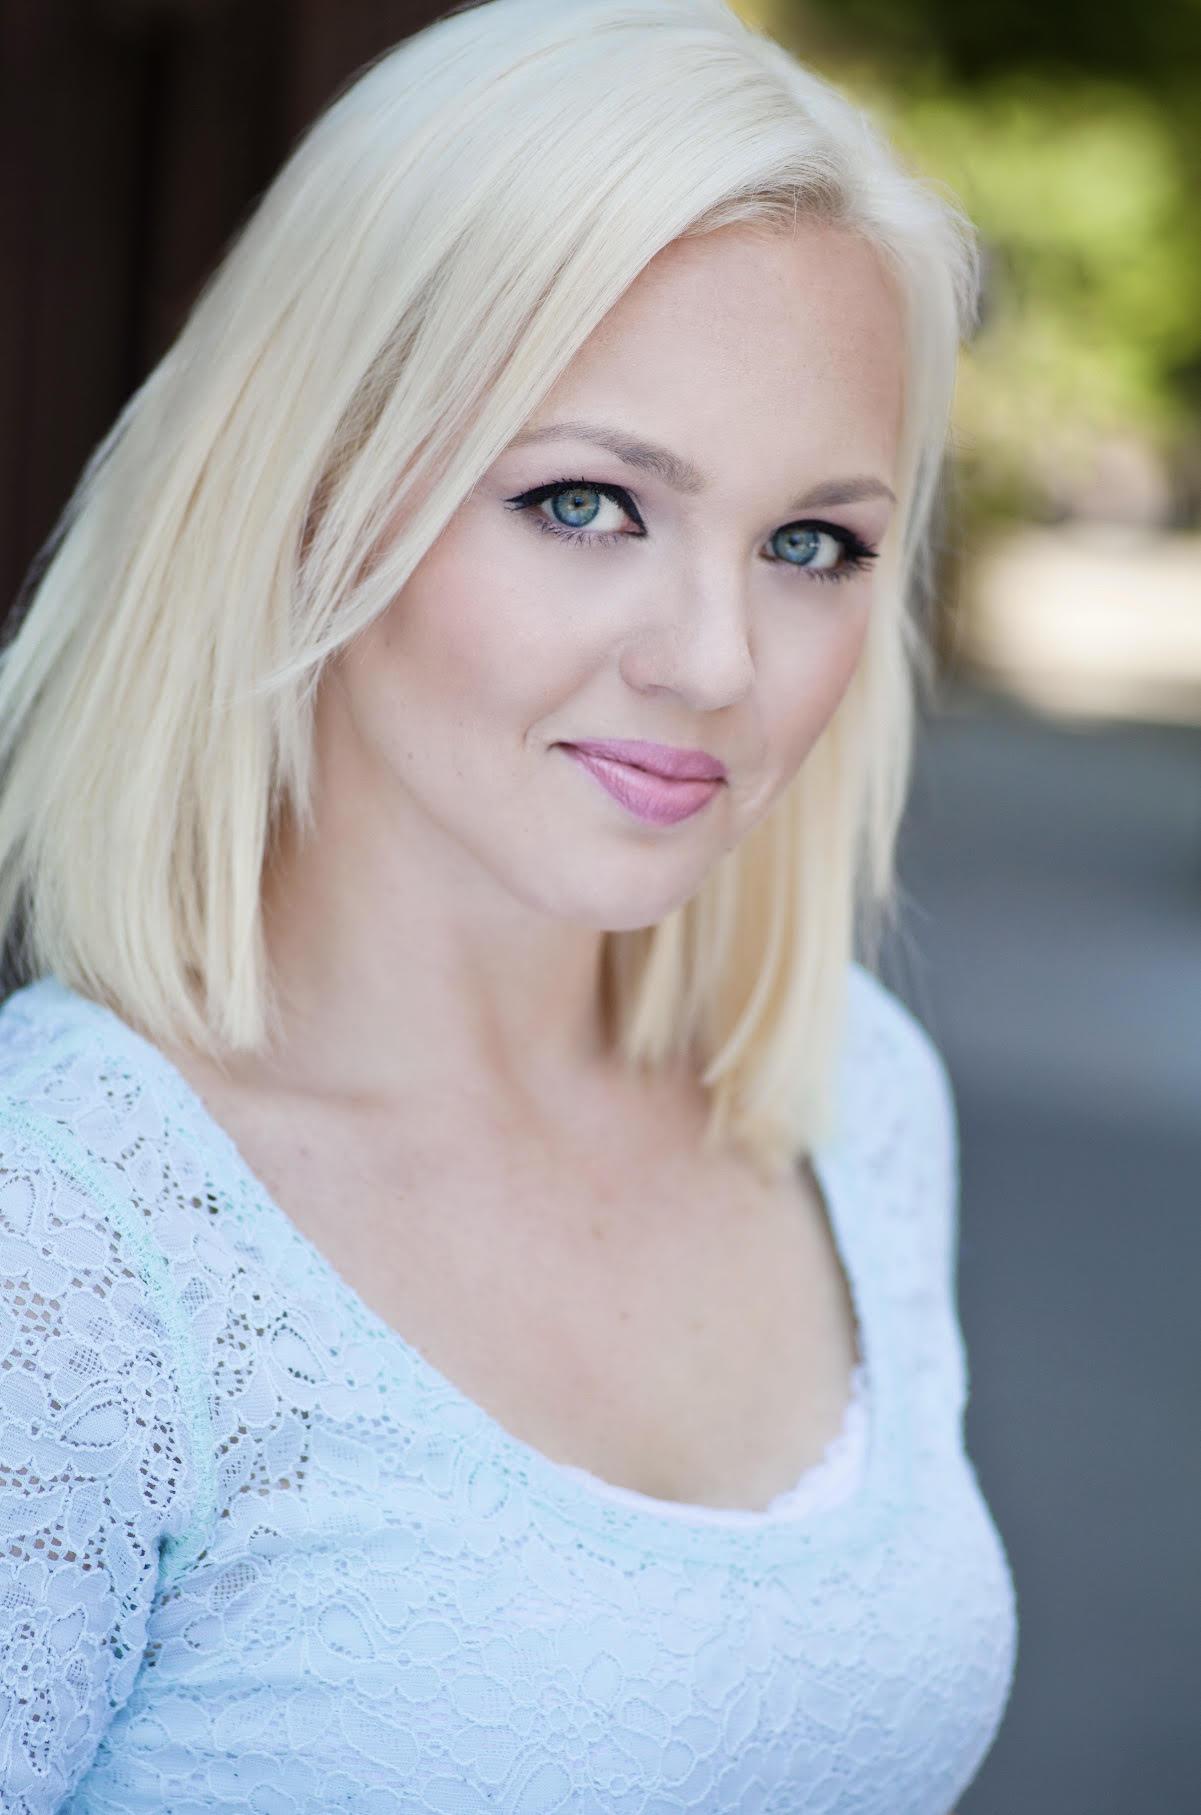 Catie Shelley